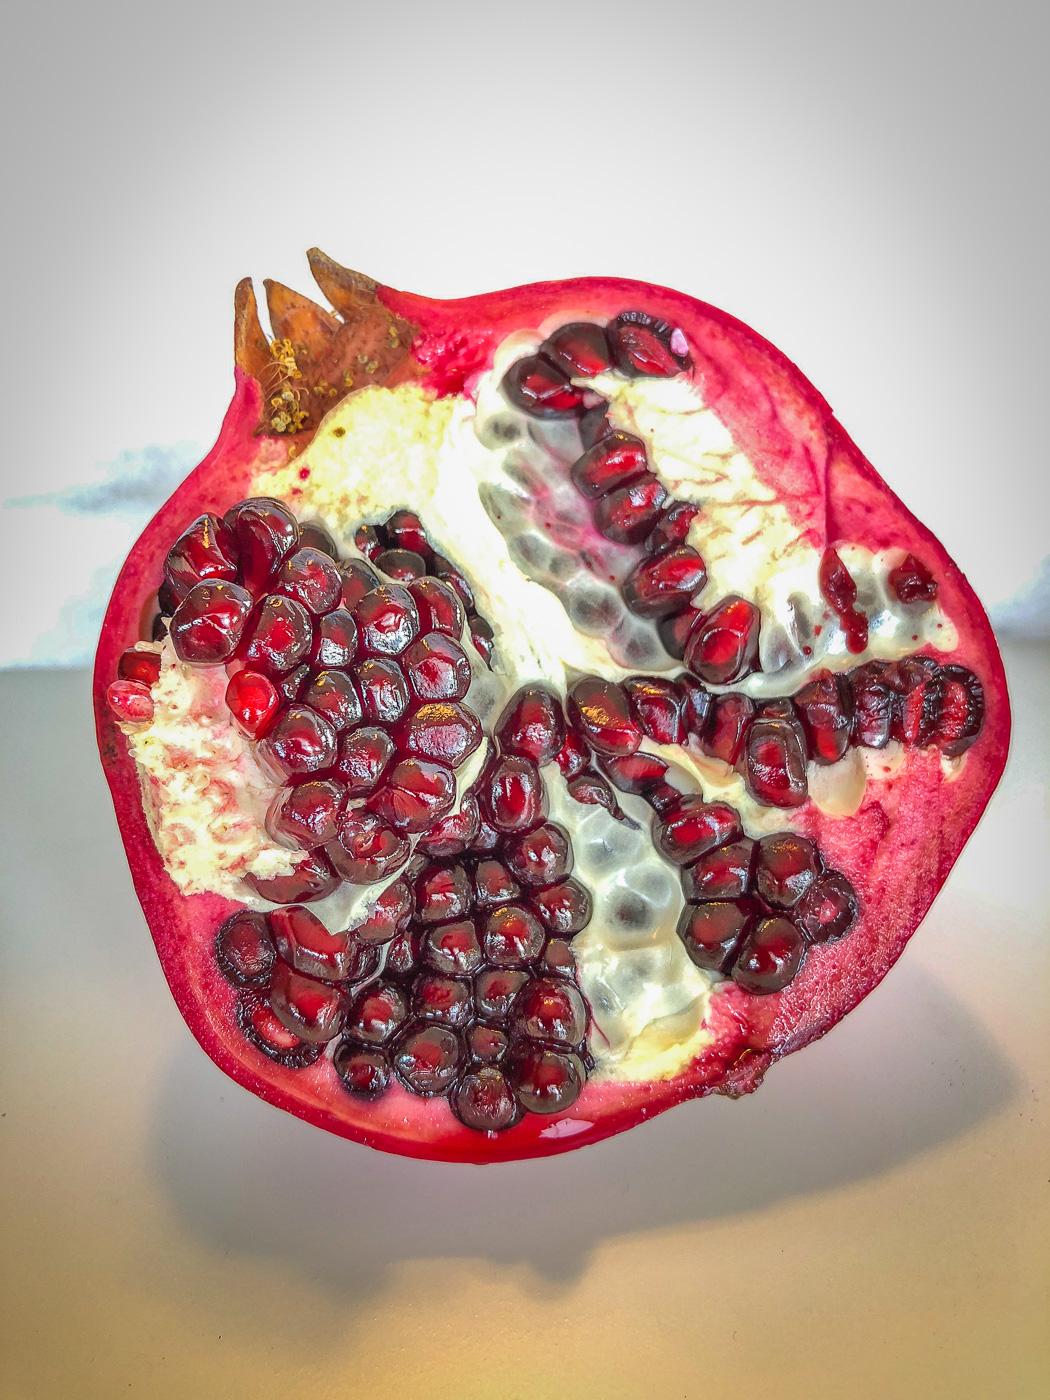 Close up shot of half a pomegranate, cut